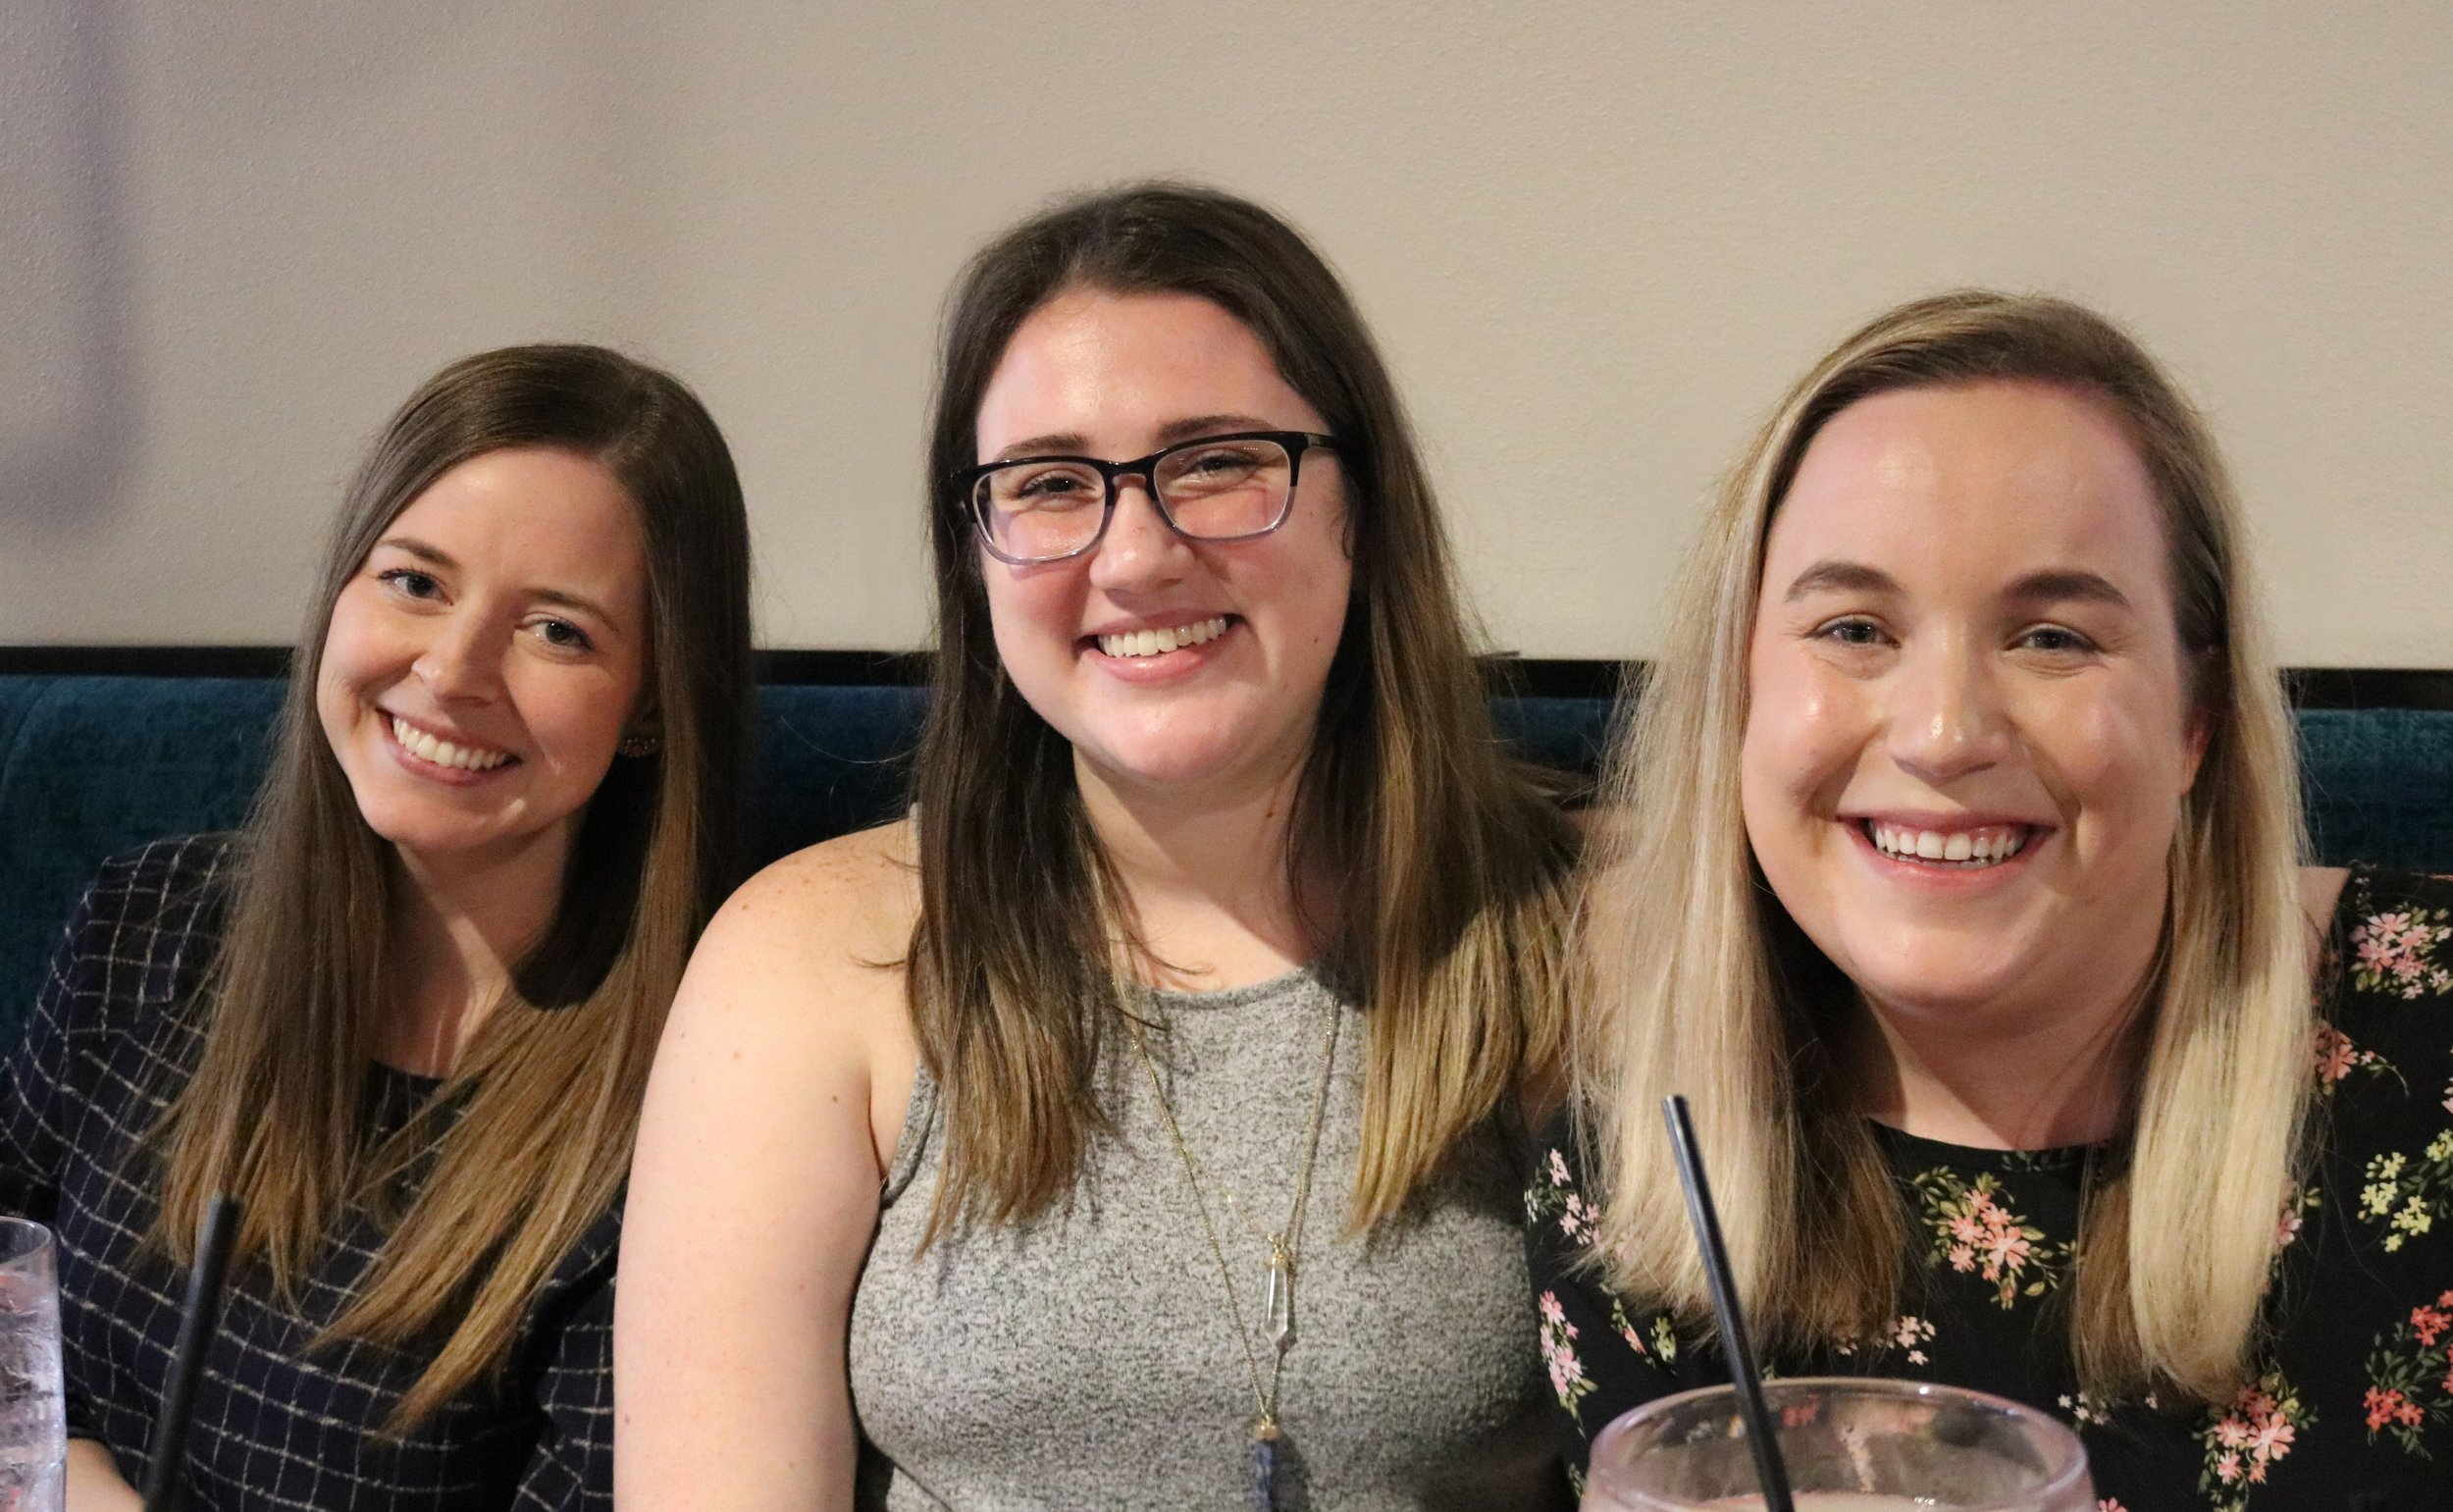 Kelsey, Taylor H, & Amanda